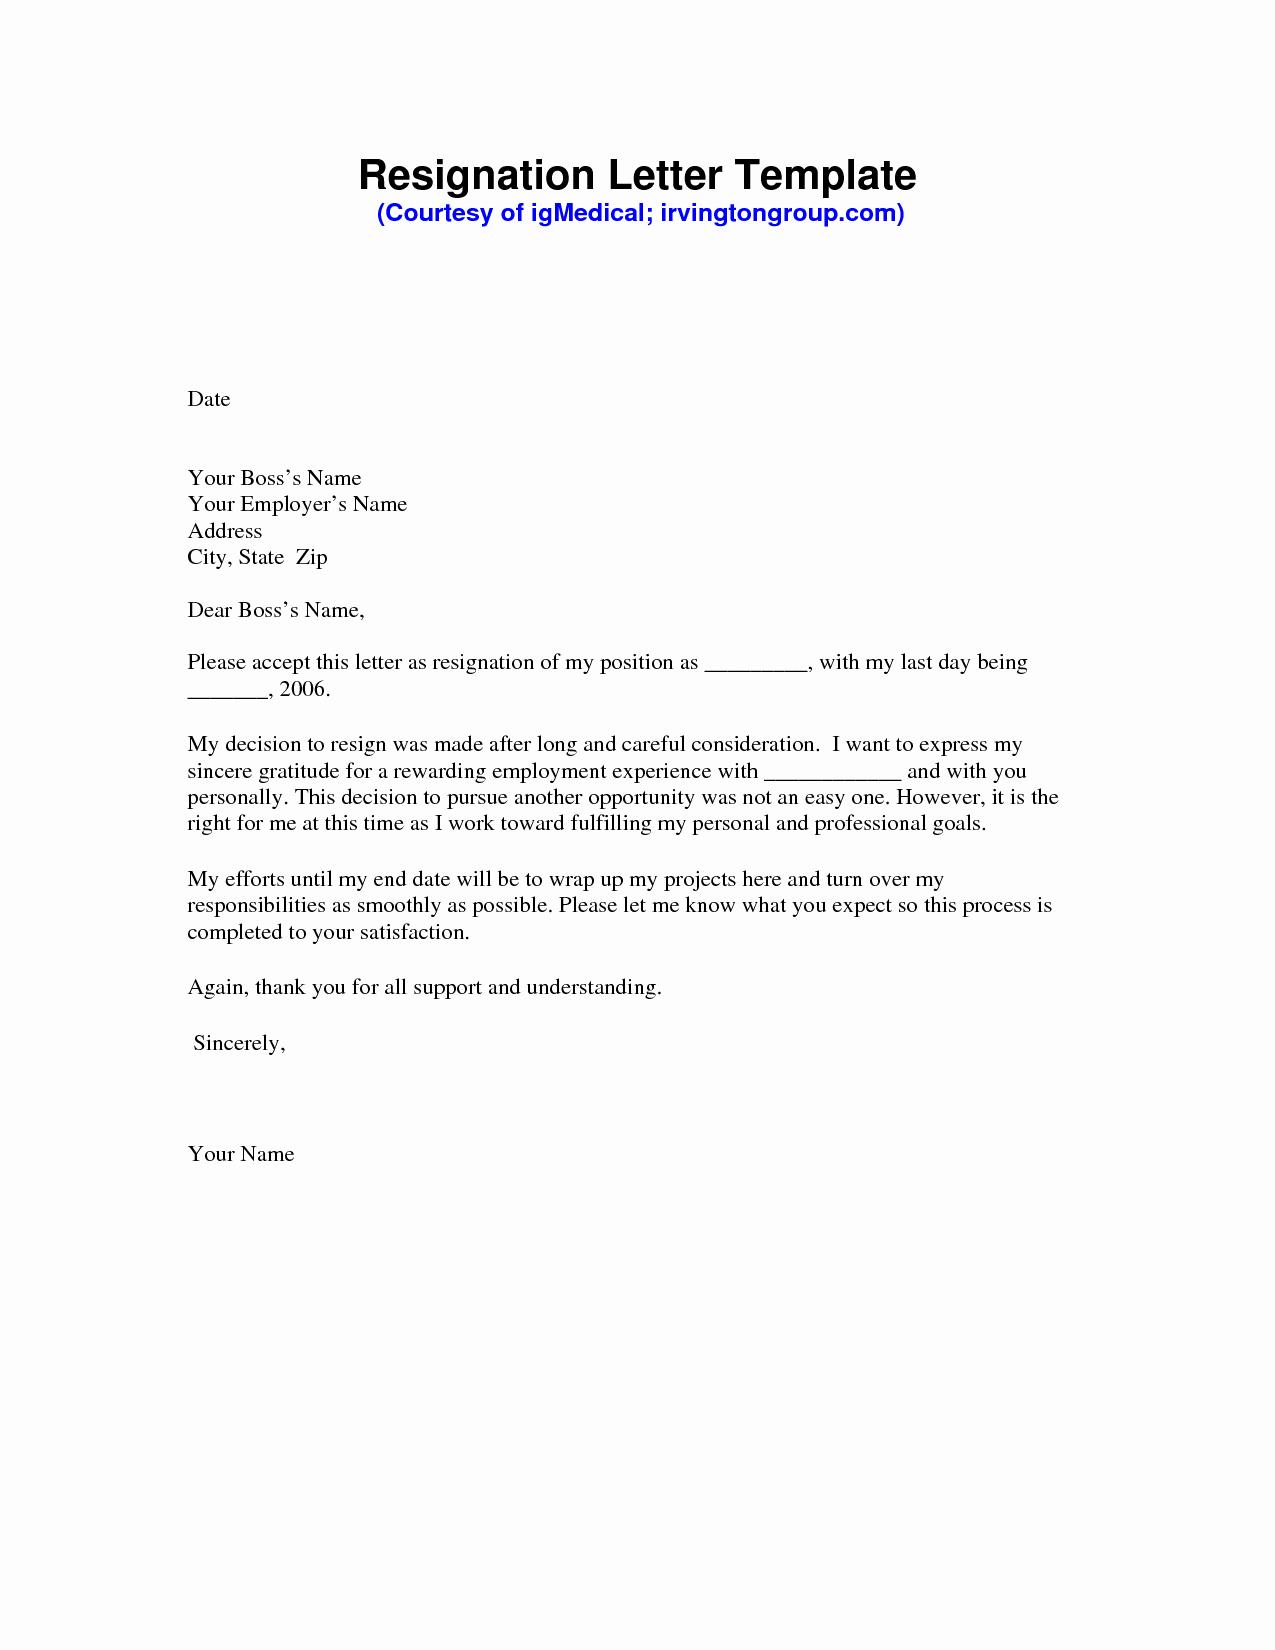 Resignation Letter format Pdf Elegant Resignation Letter Sample Pdf